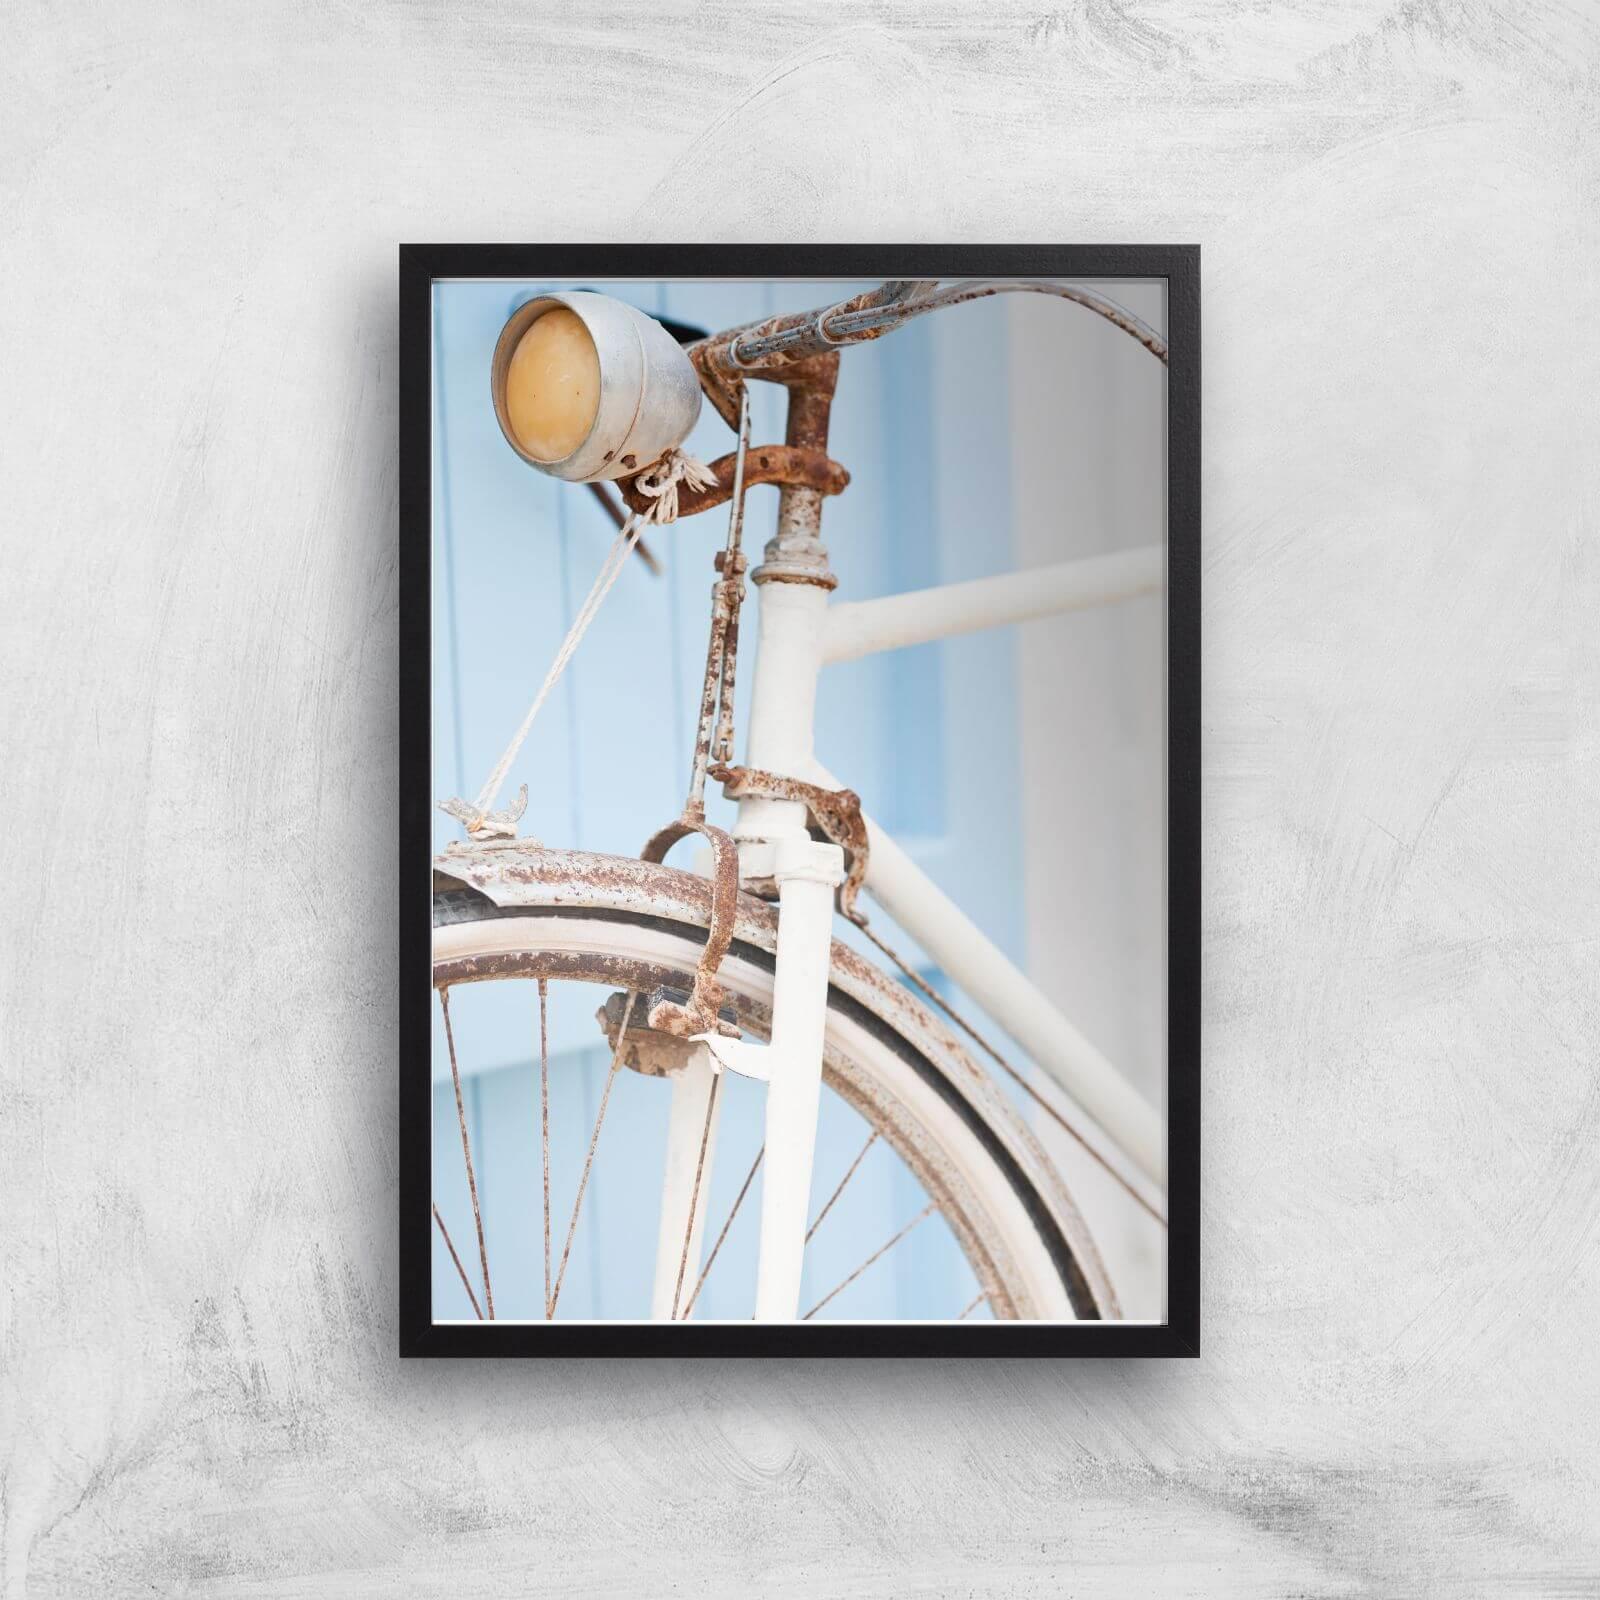 Rusty Bicycle Giclee Art Print   A4   Black Frame